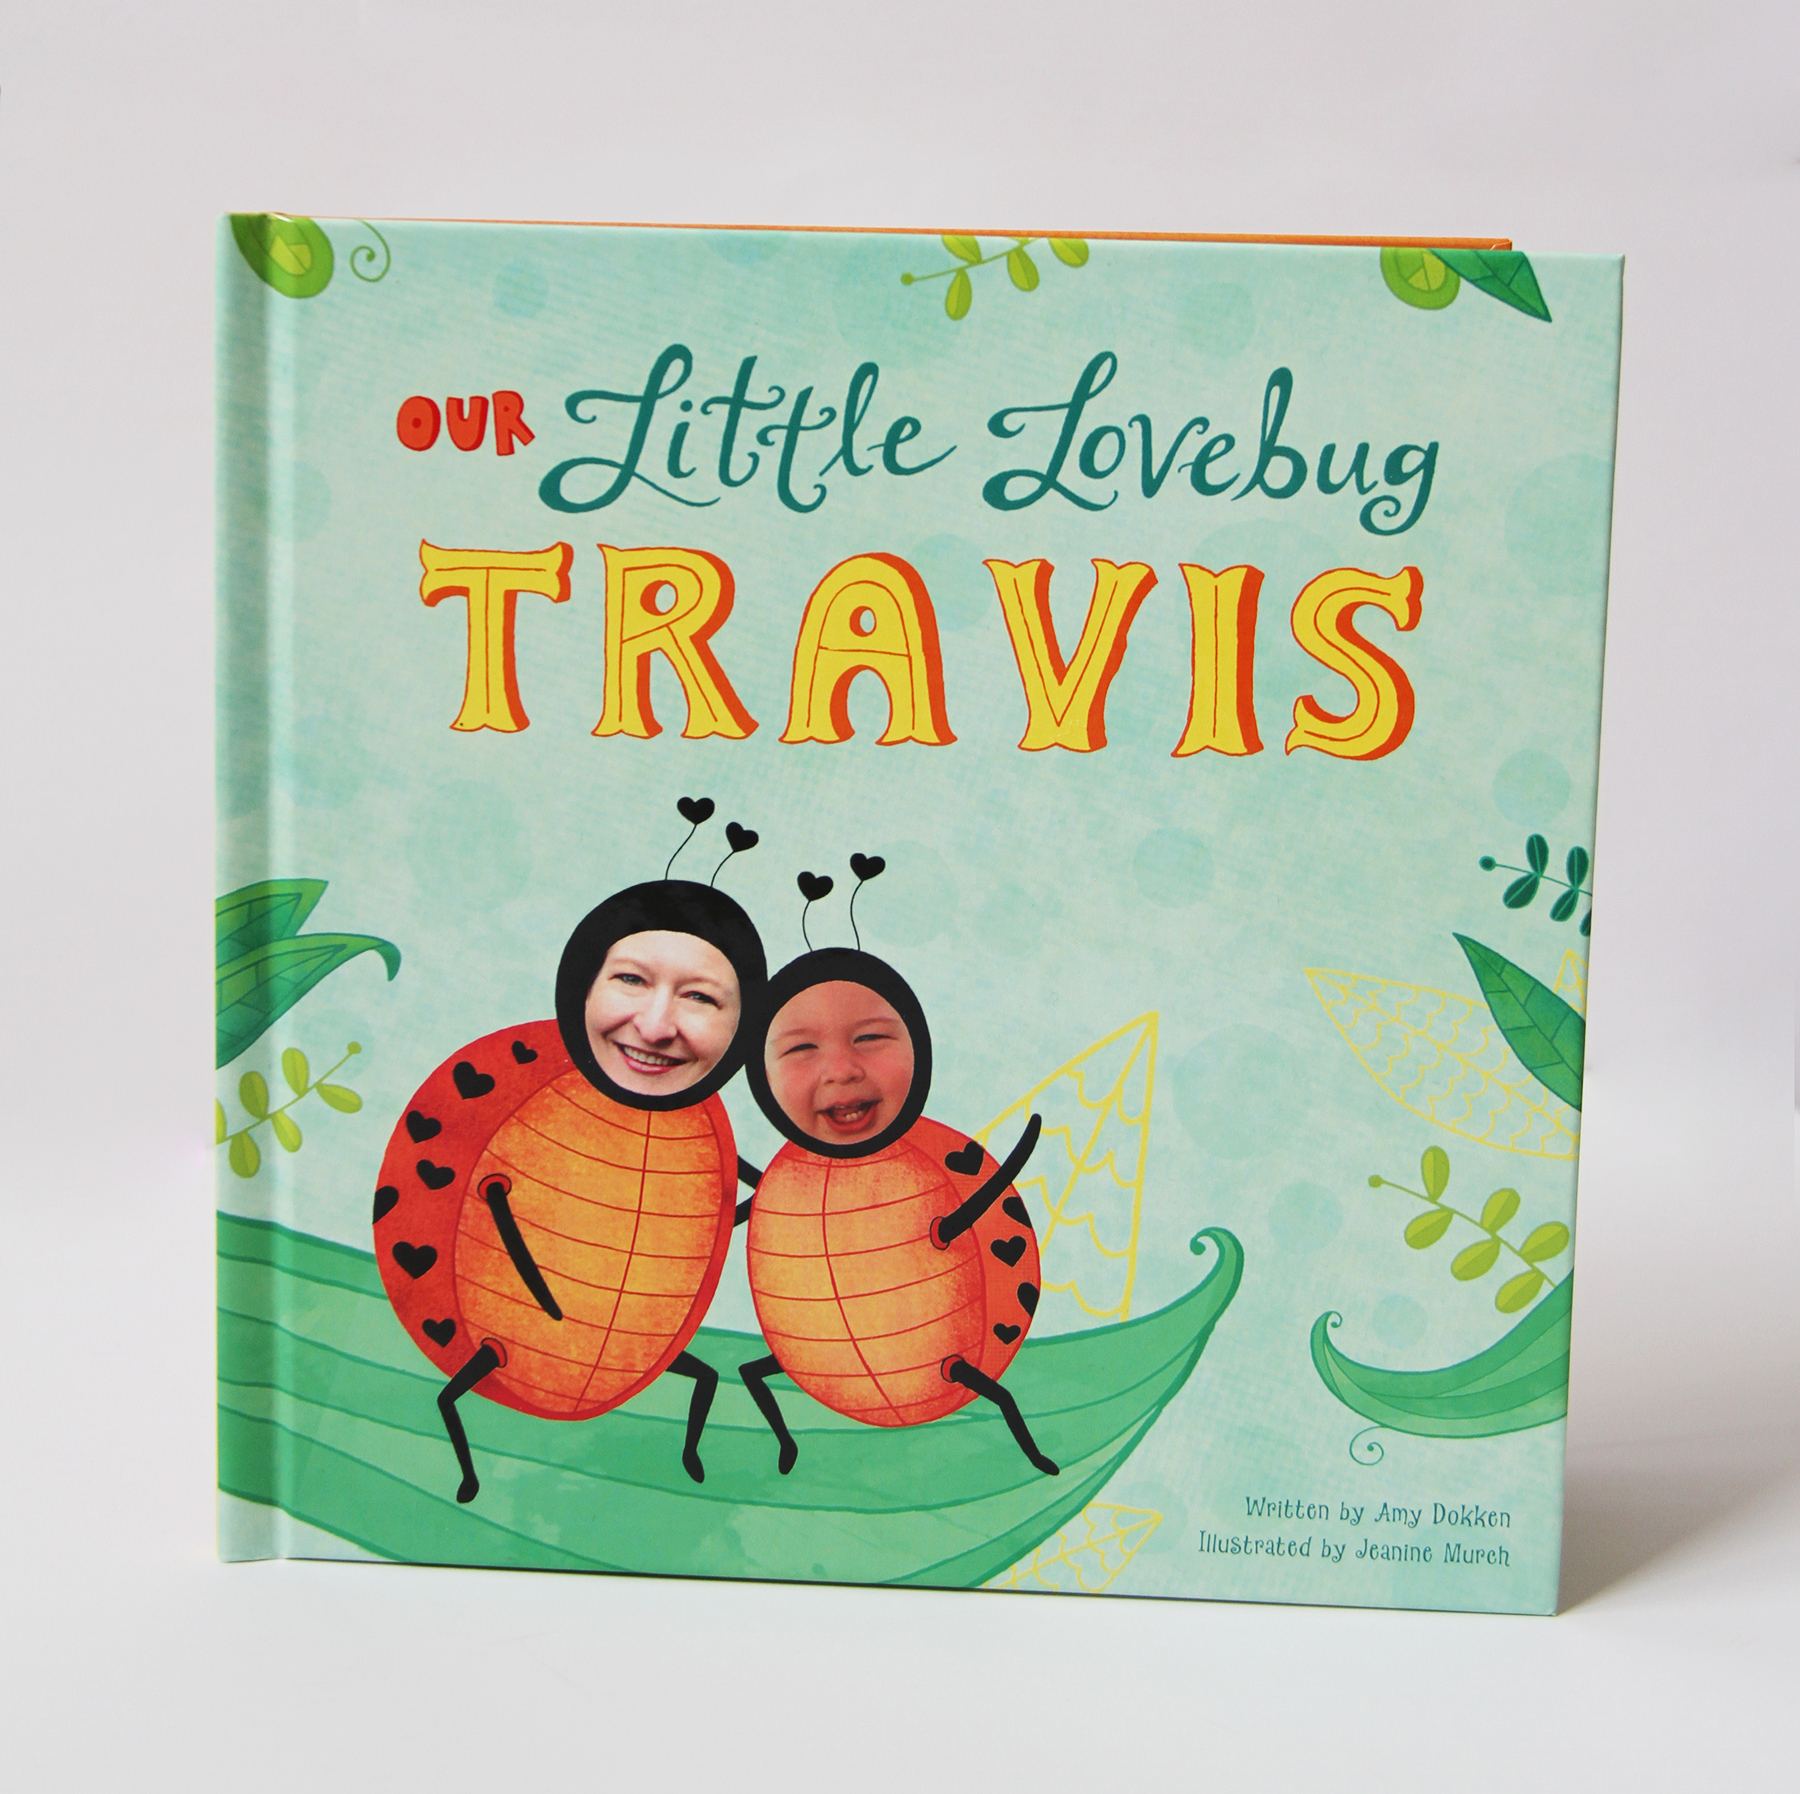 Lovebug_Booksample1.jpg